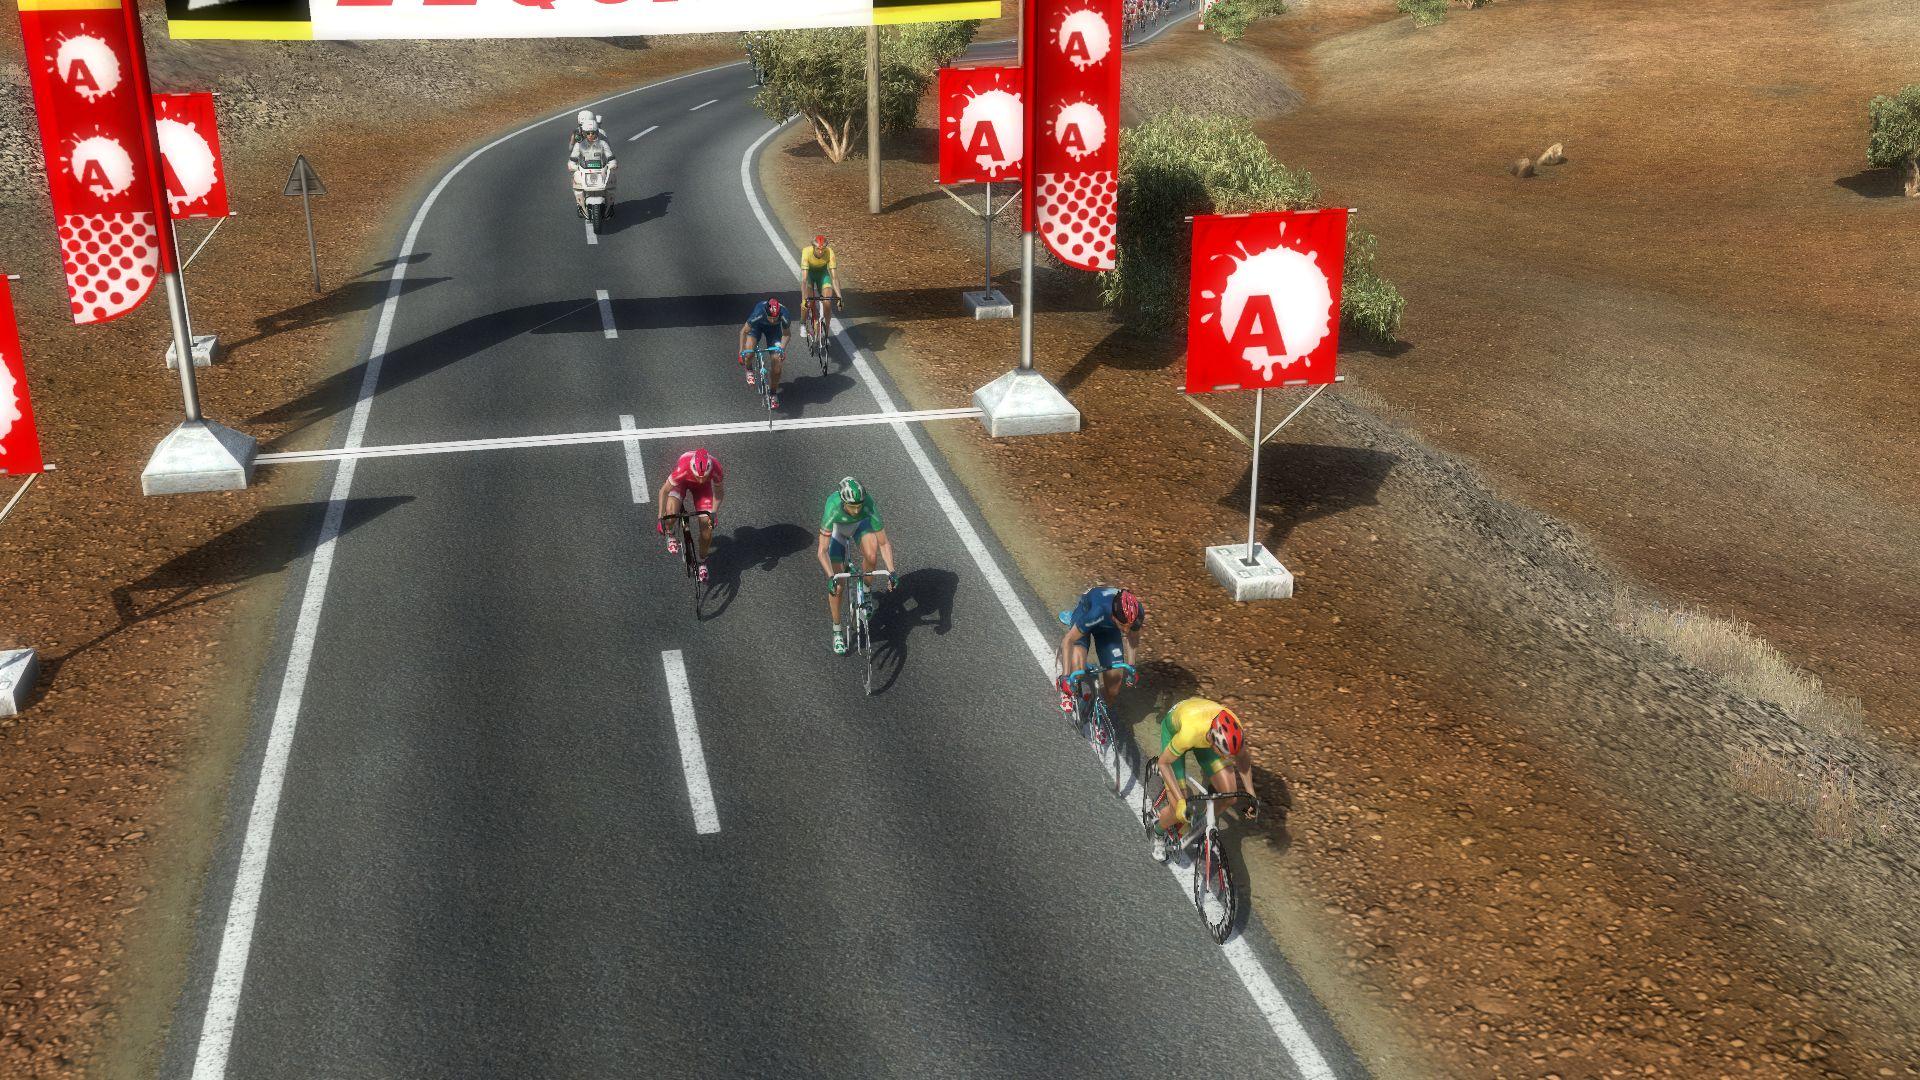 pcmdaily.com/images/mg/2019/Races/PTHC/East%20Java/JavaS1%203.jpg